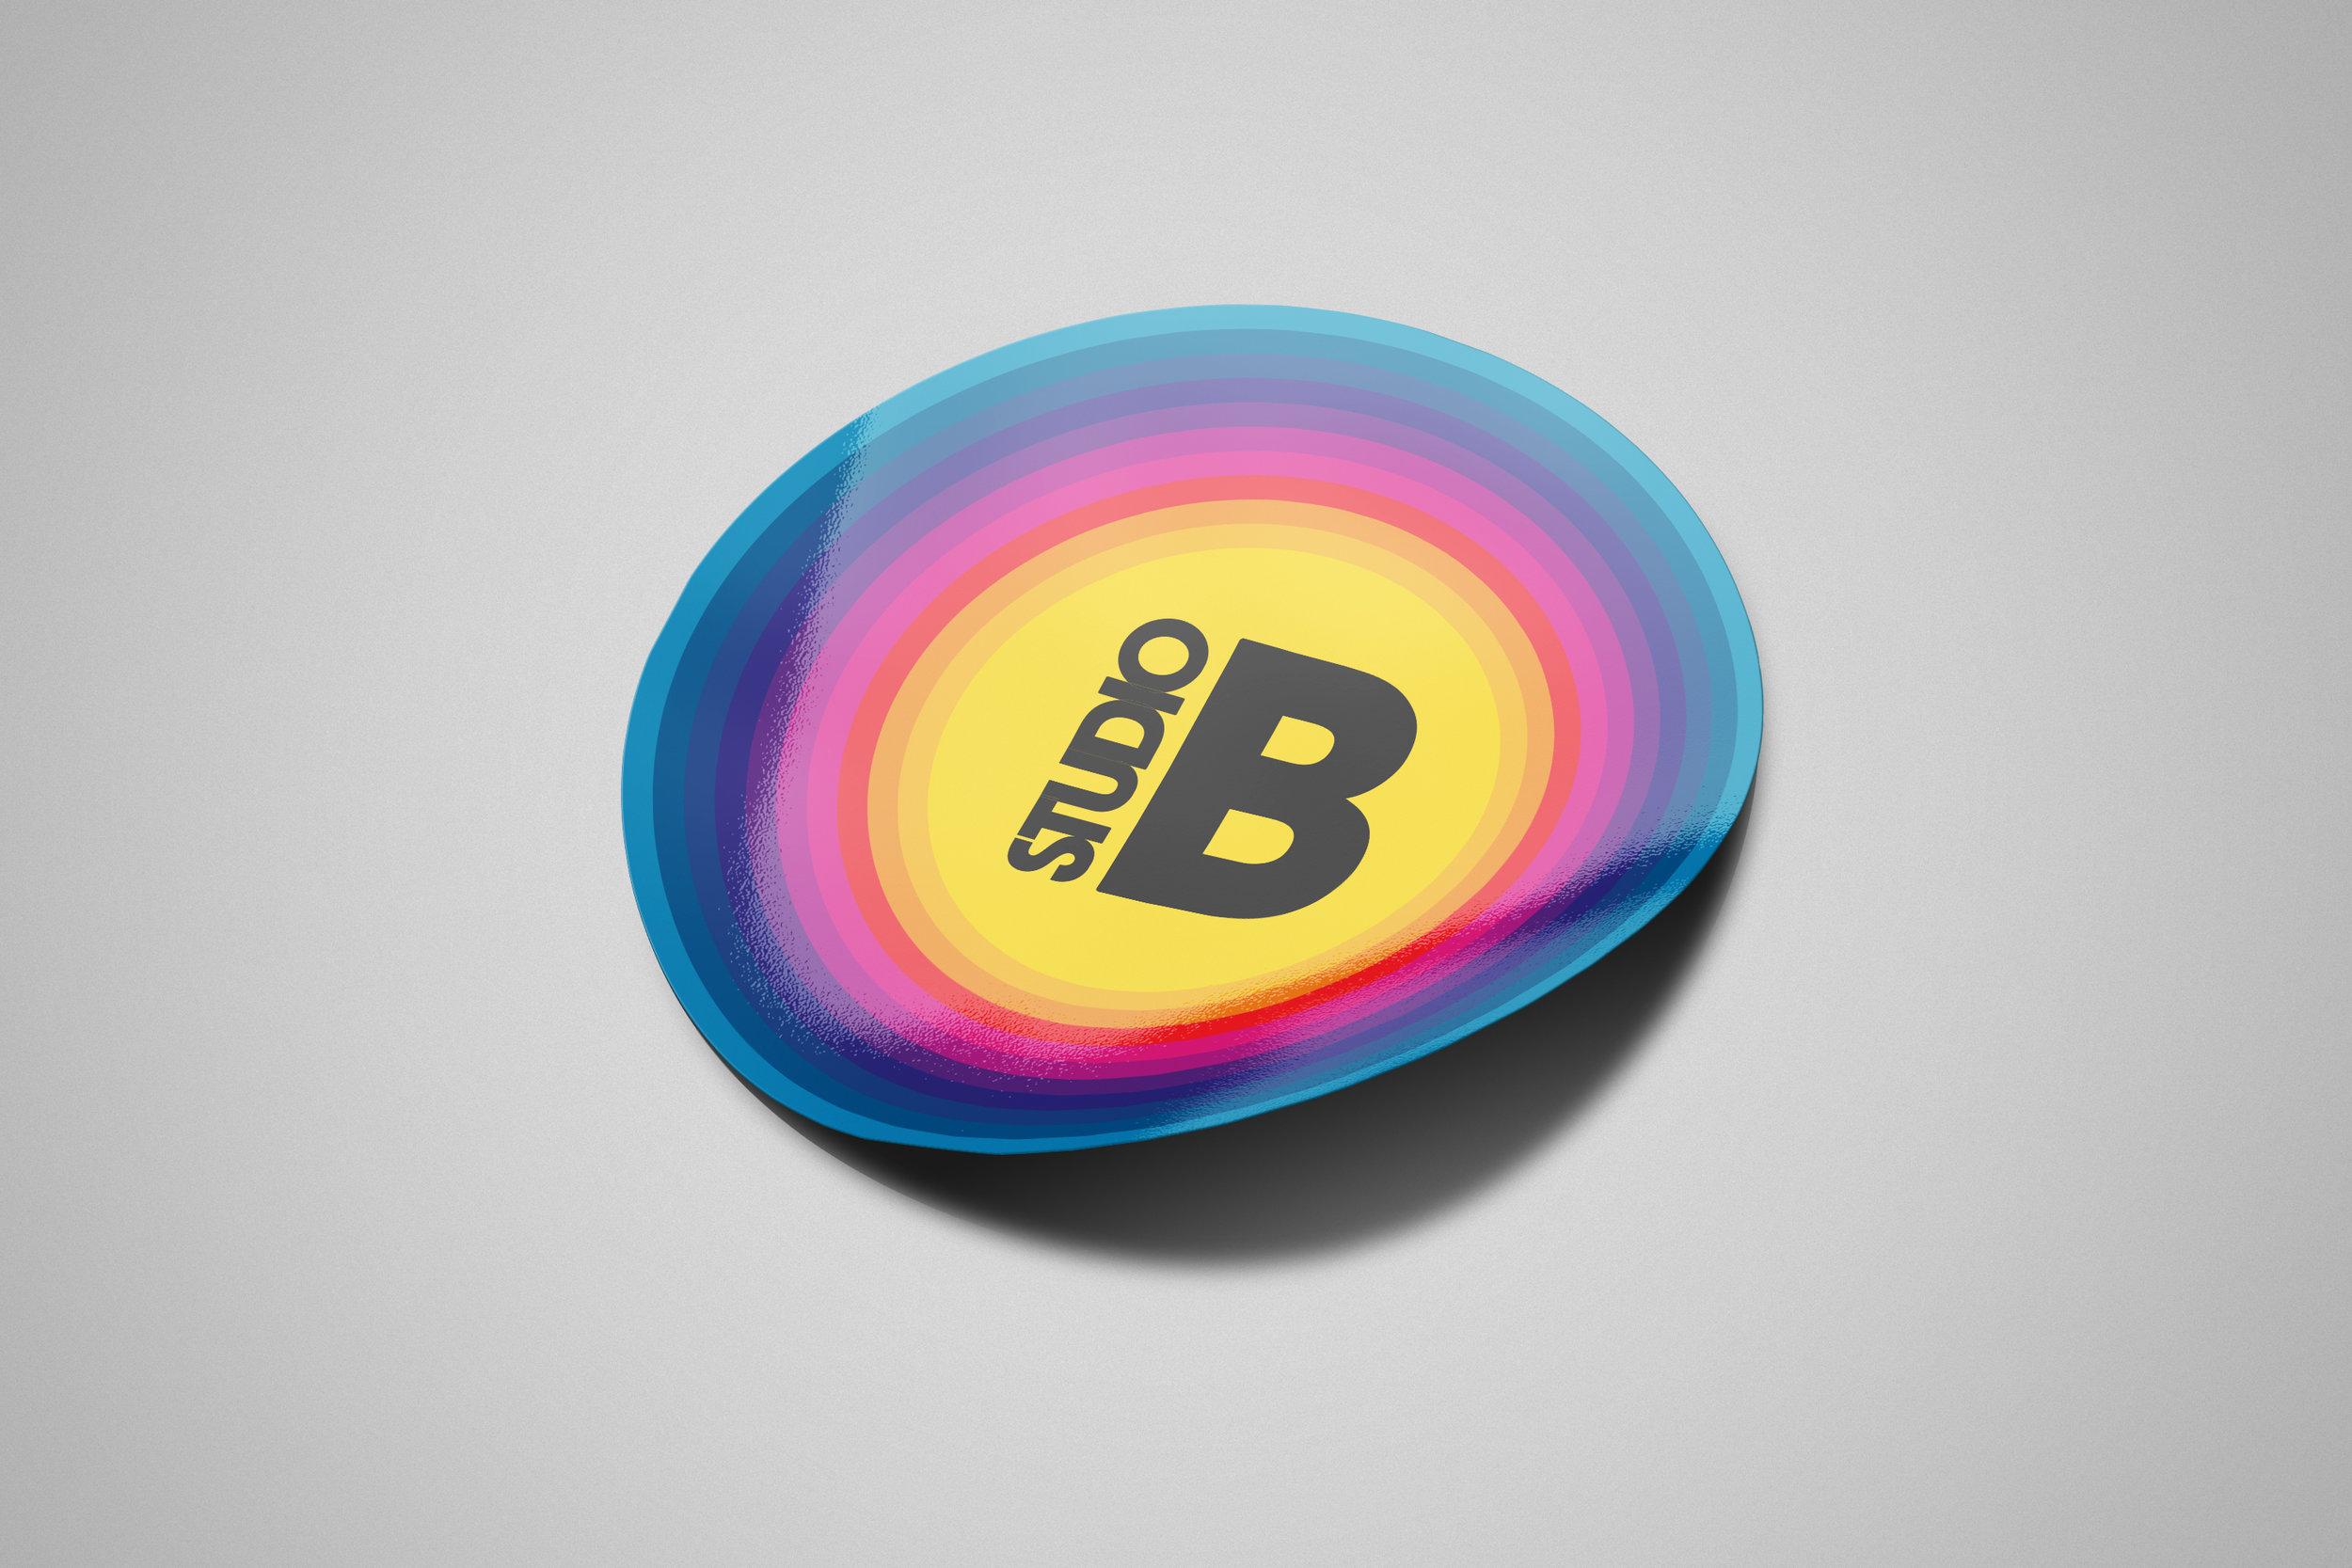 Studio-B-Sticker.jpg